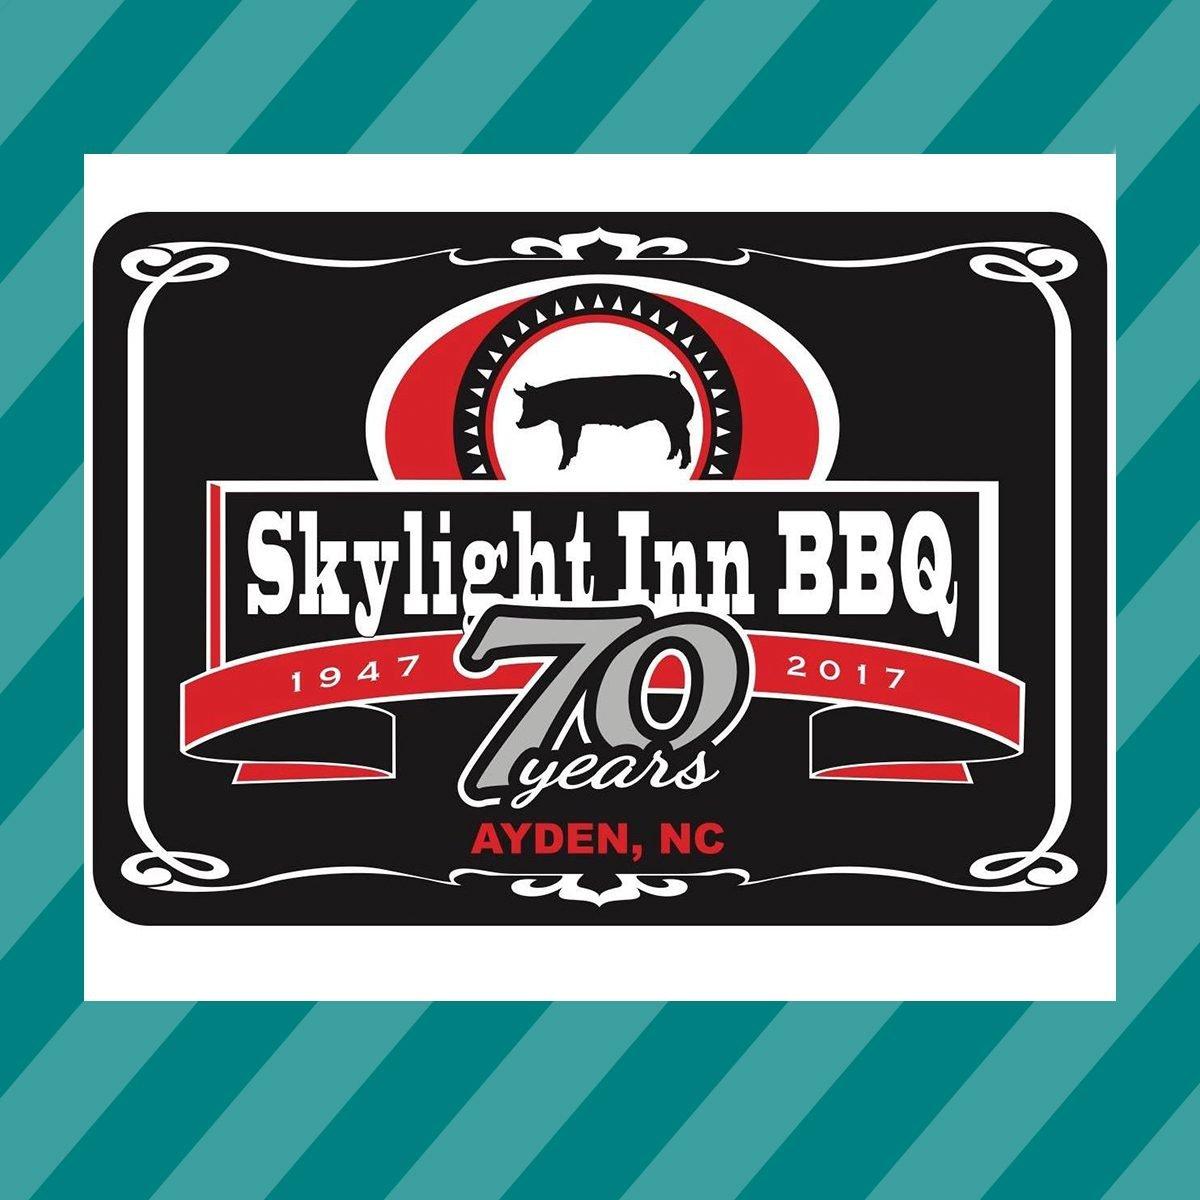 Skylight Inn BBQ